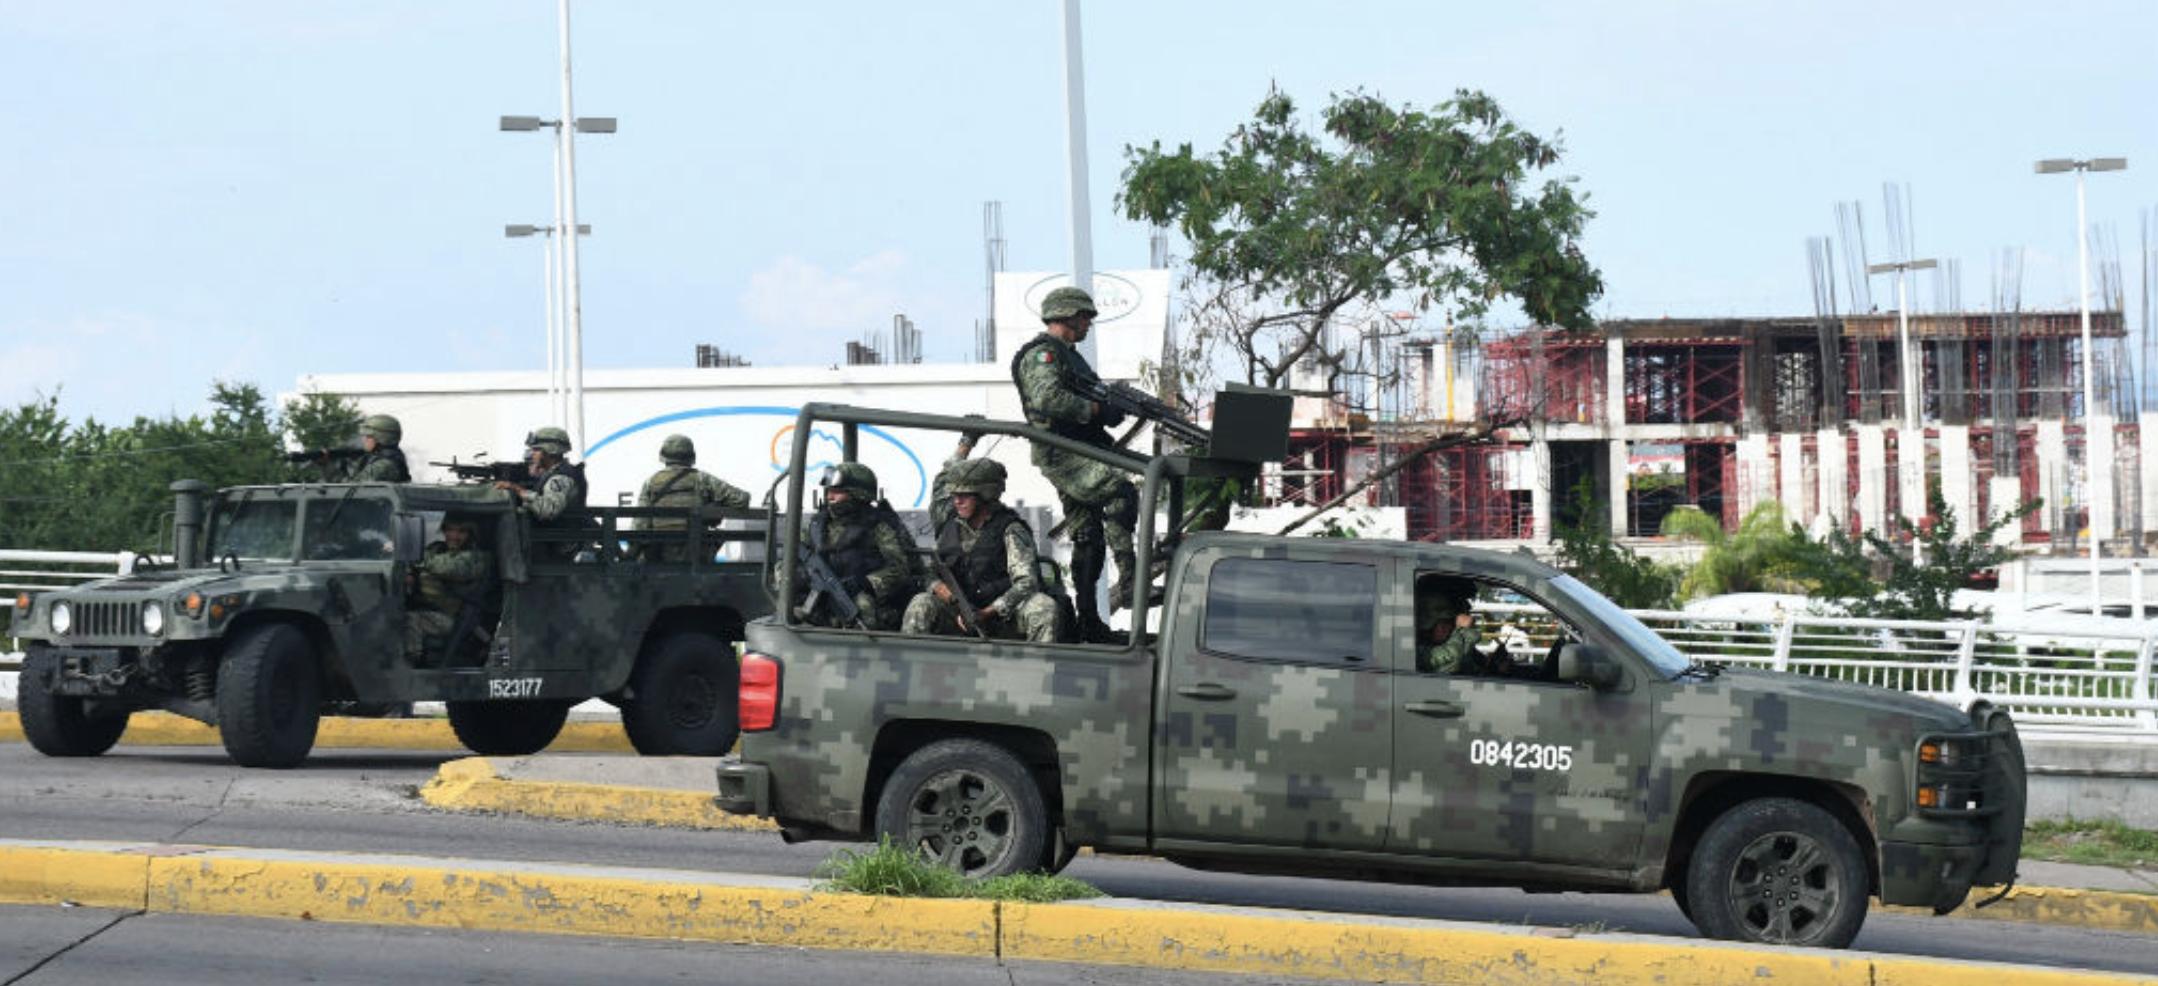 The Battle for Nuevo Laredo part II